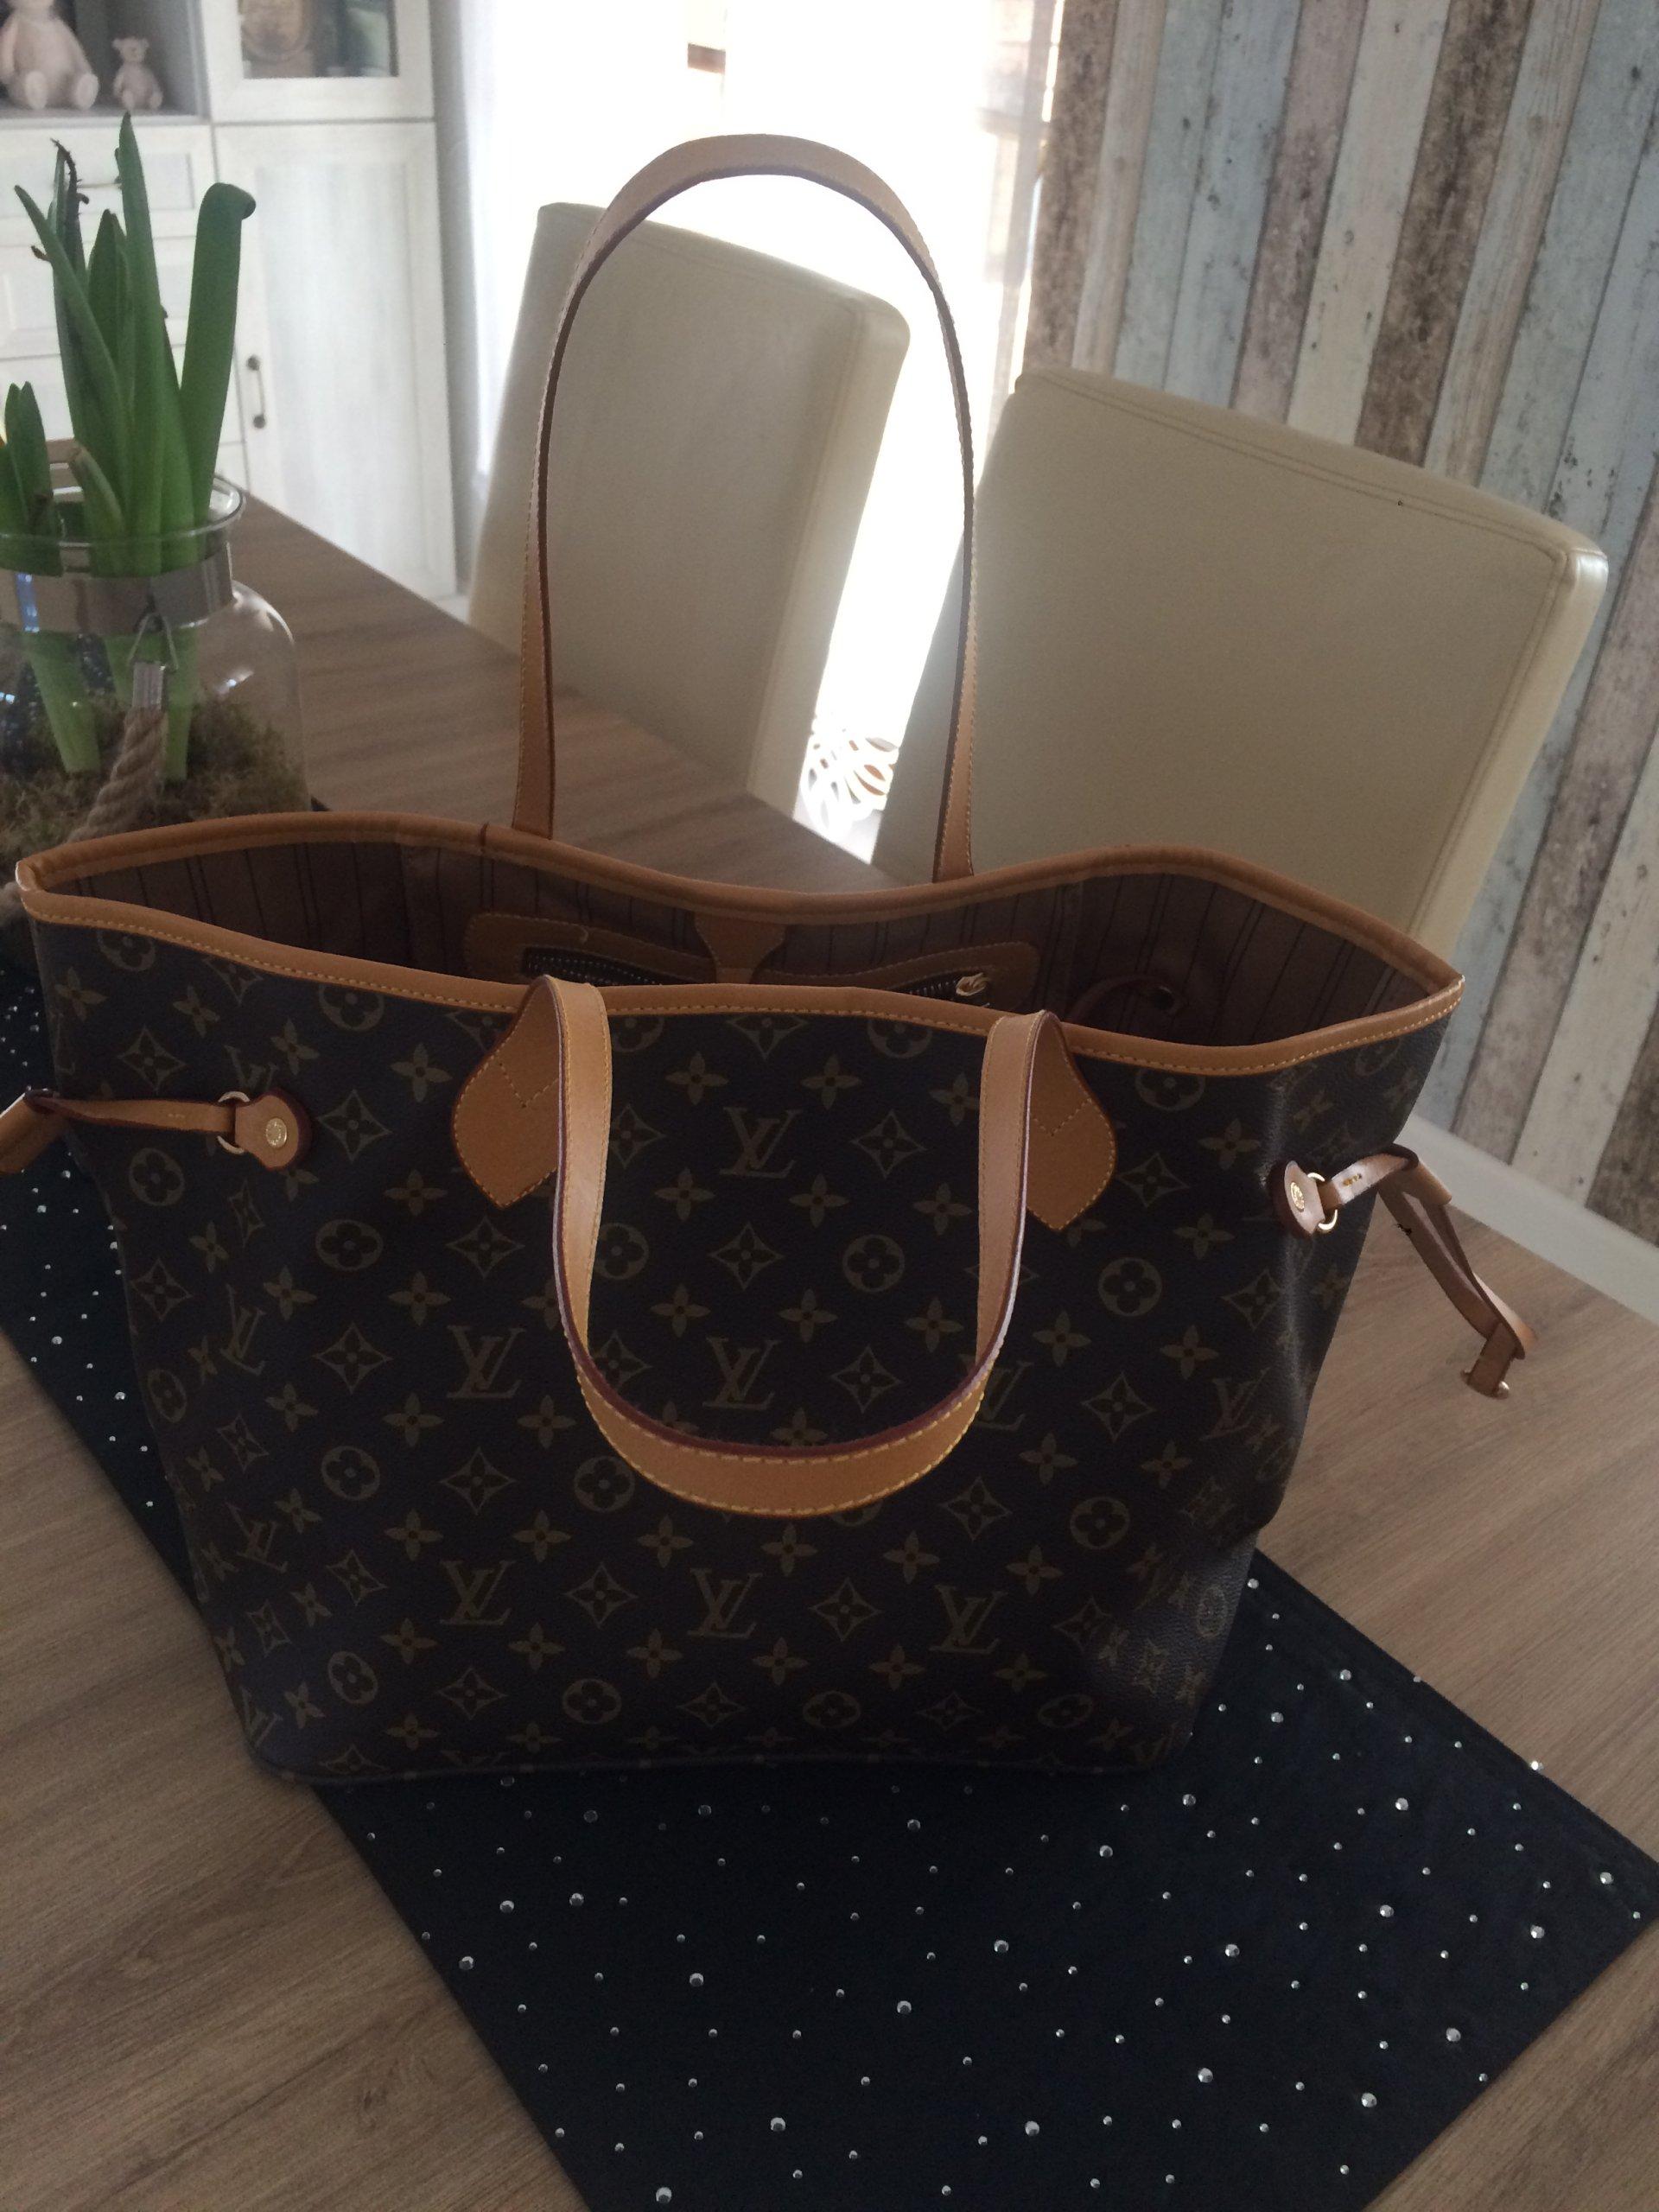 5811d7038ca94 Torebka Louis Vuitton Neverfull MM nowa - 7208993233 - oficjalne ...